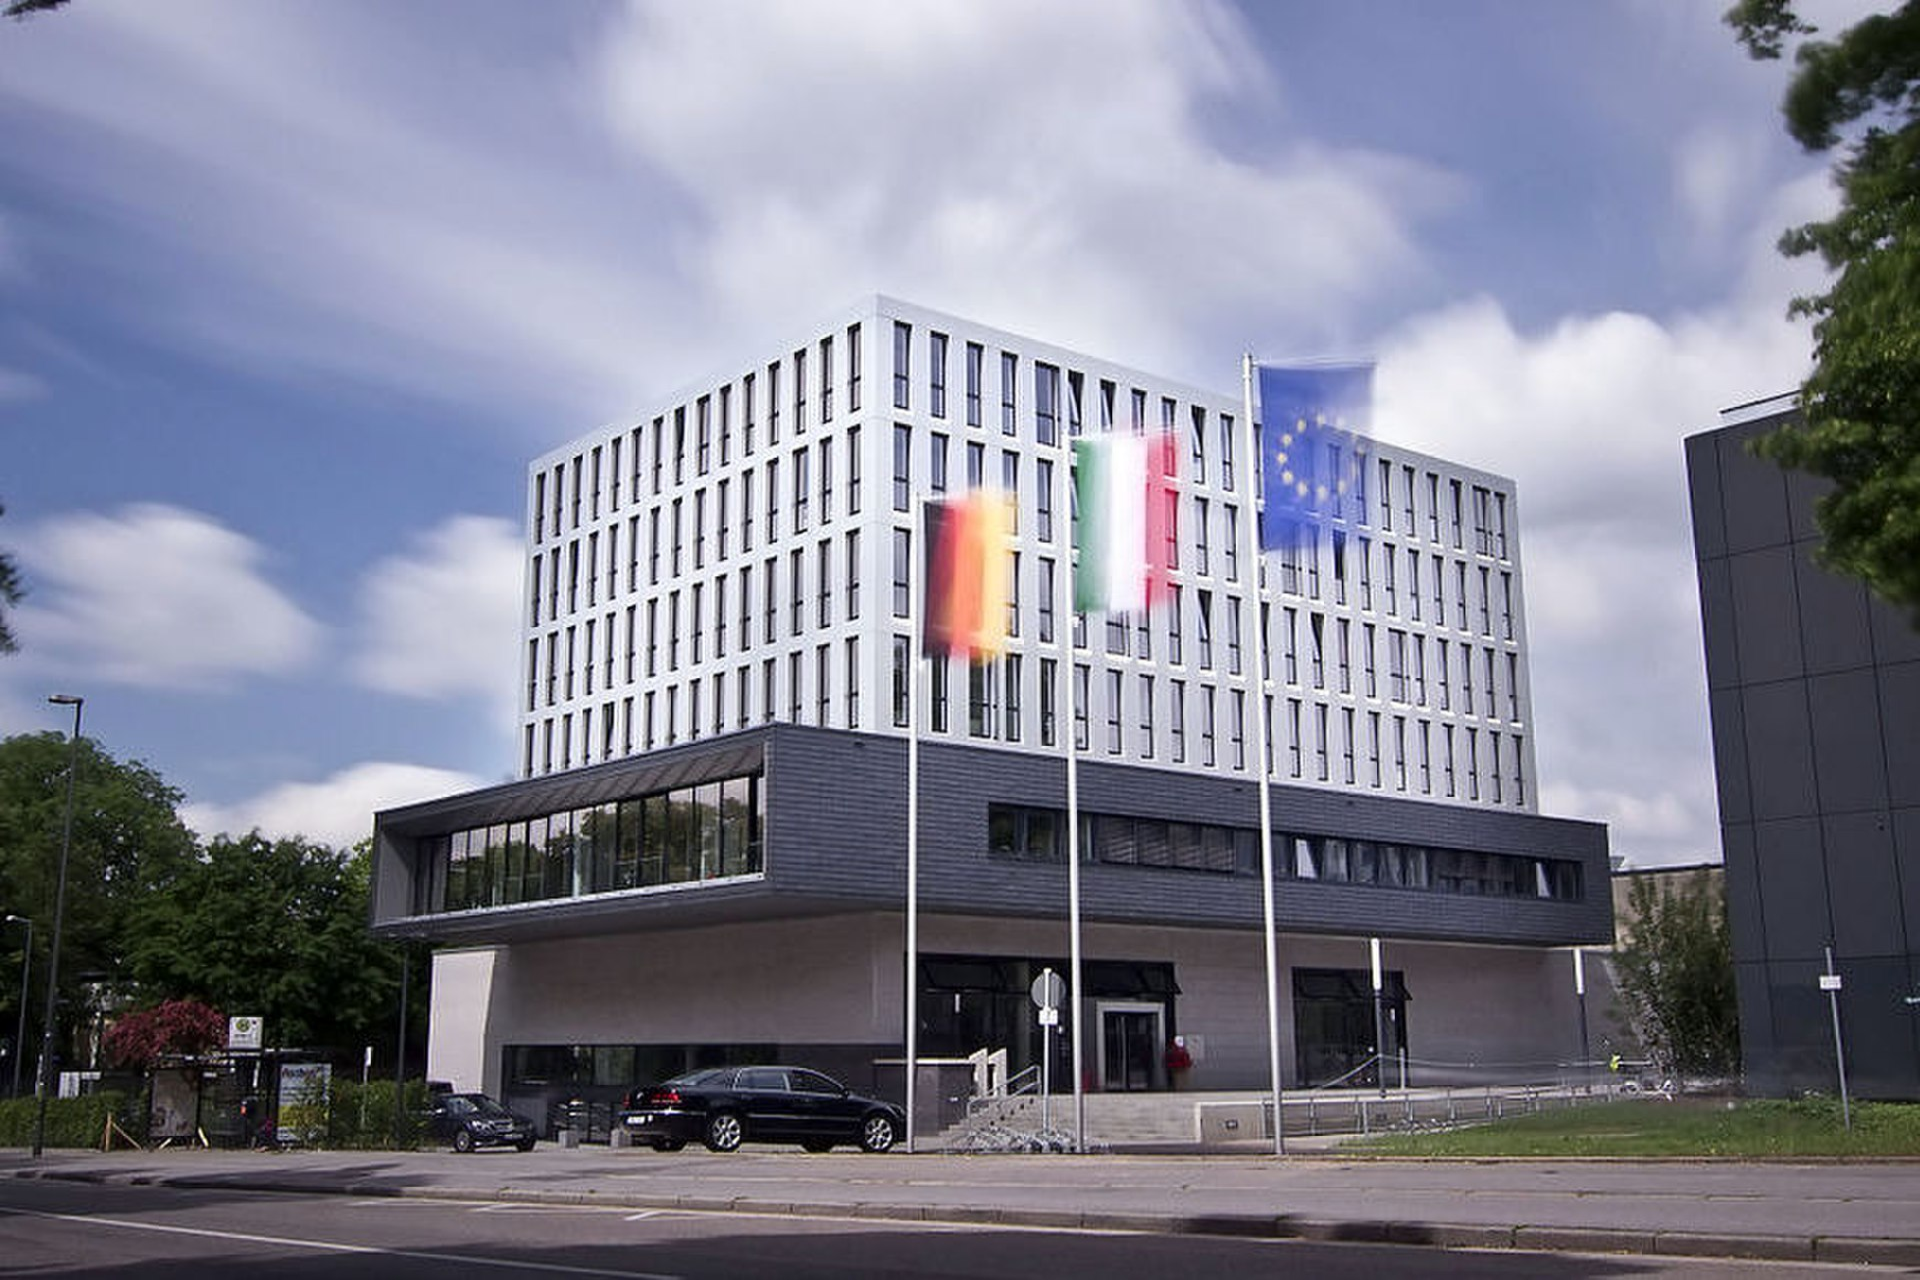 Fh aachen wikipedia for Fachhochschule architektur